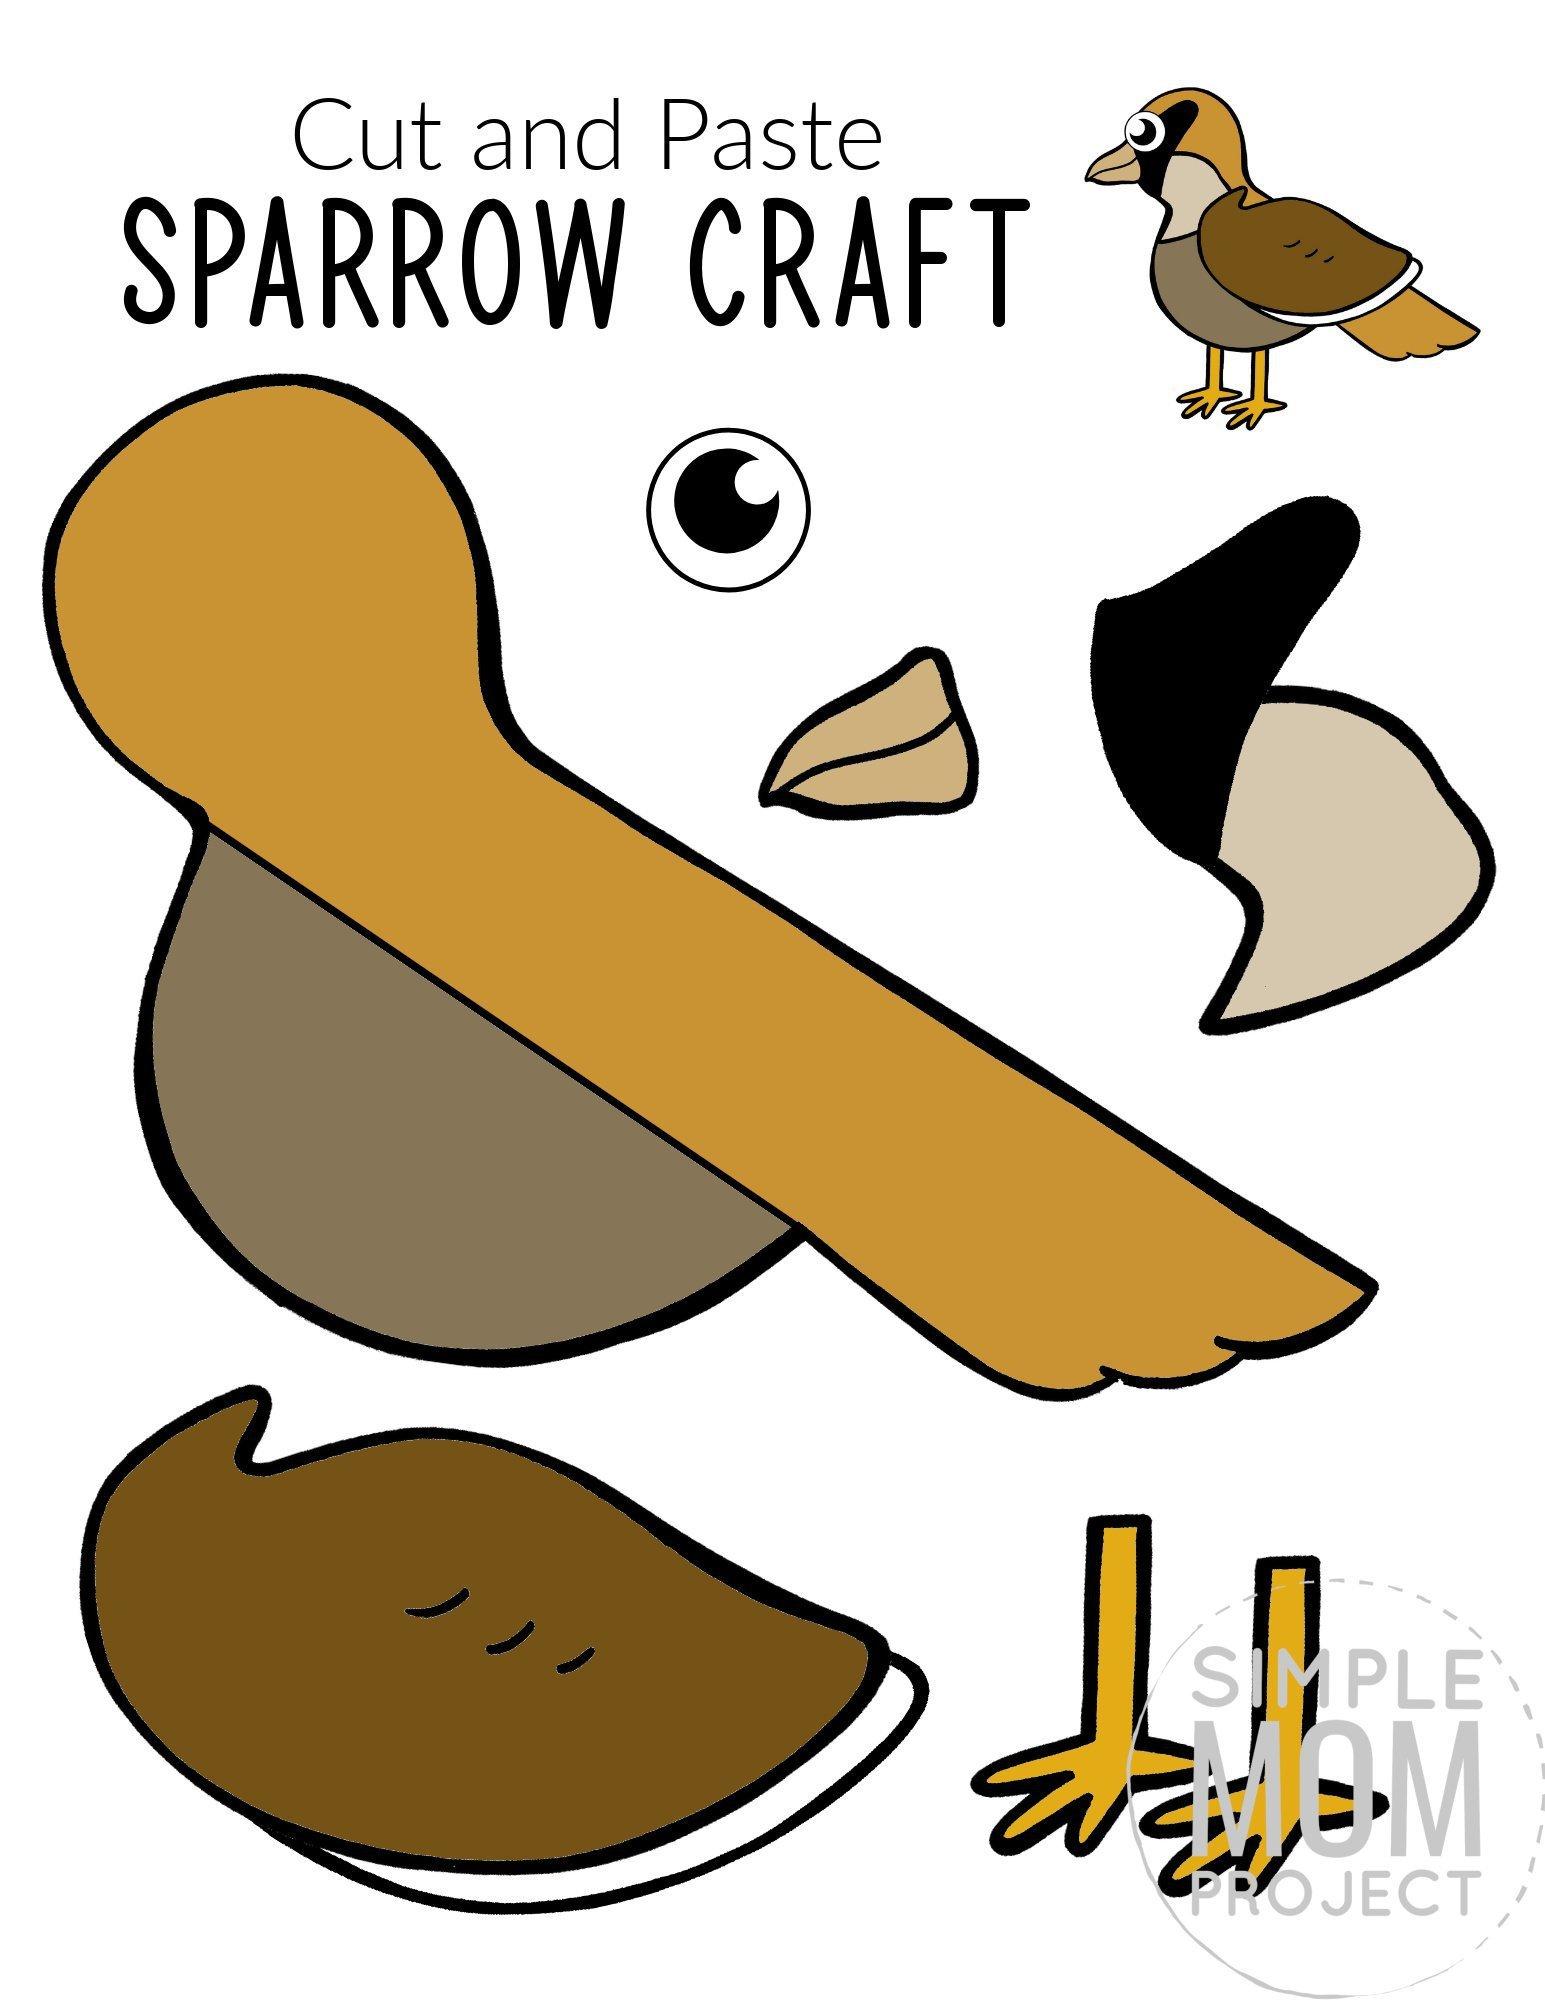 Free Printable Sparrow Craft for Kids, preschoolers toddlers and kindergartners